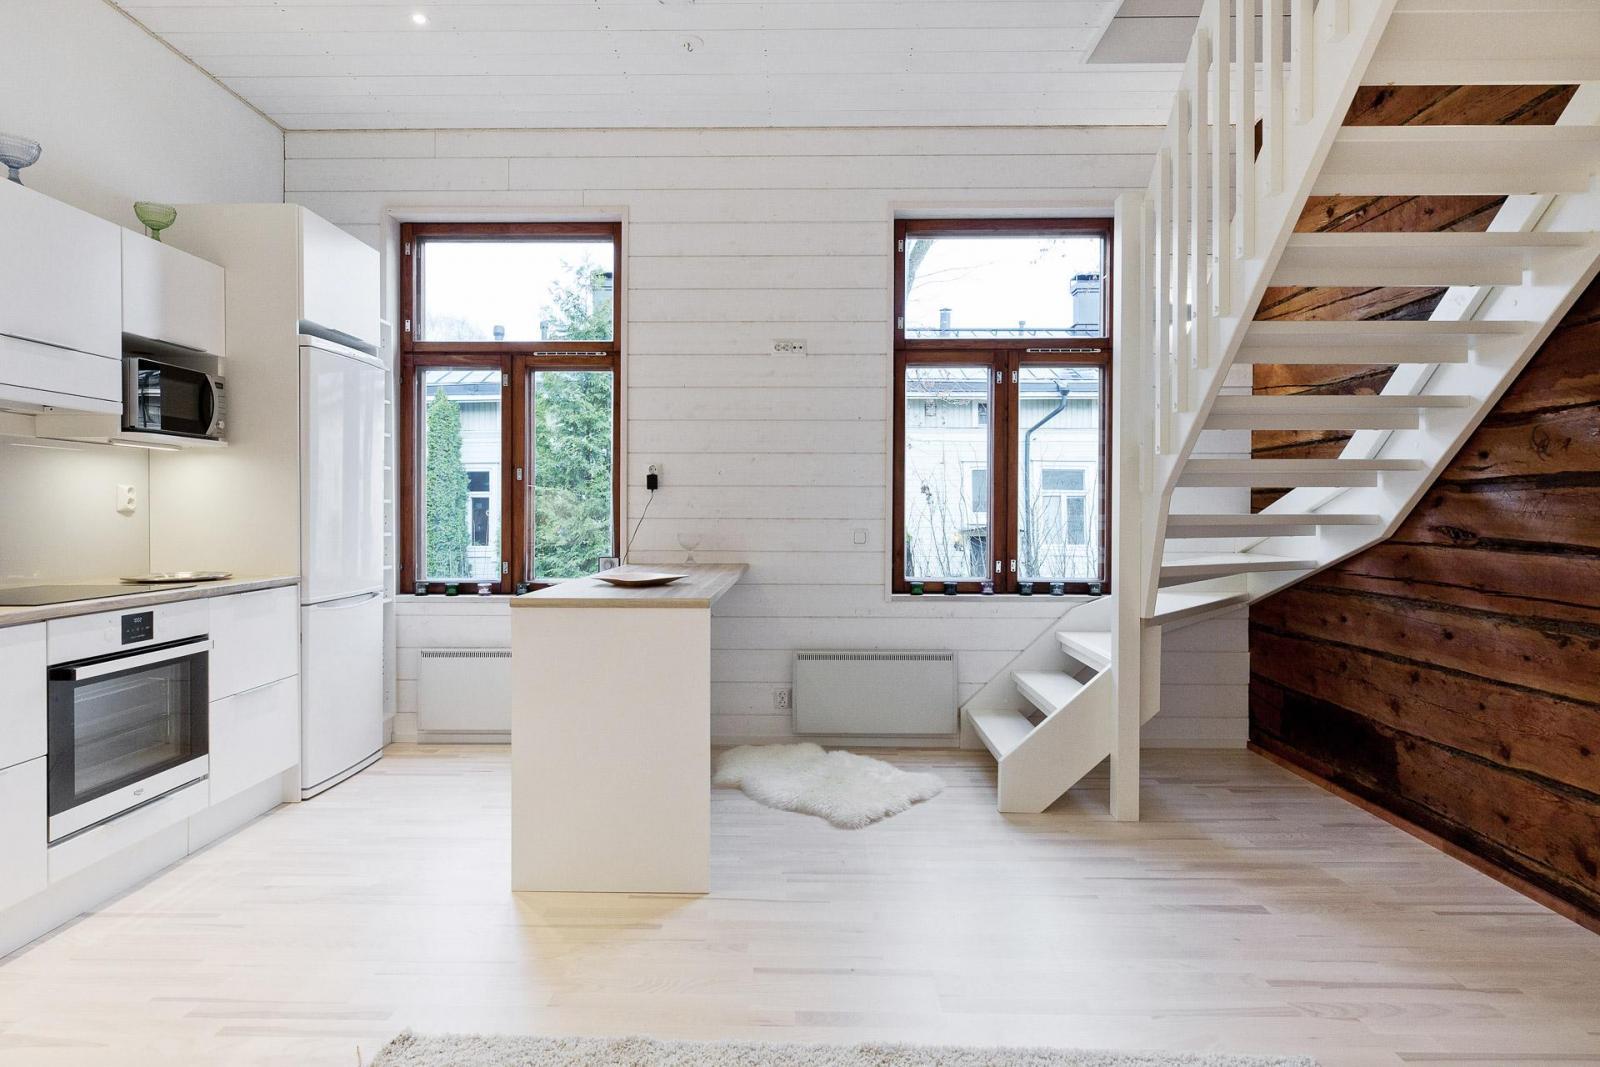 Turku Martti vanha puutalo-osake